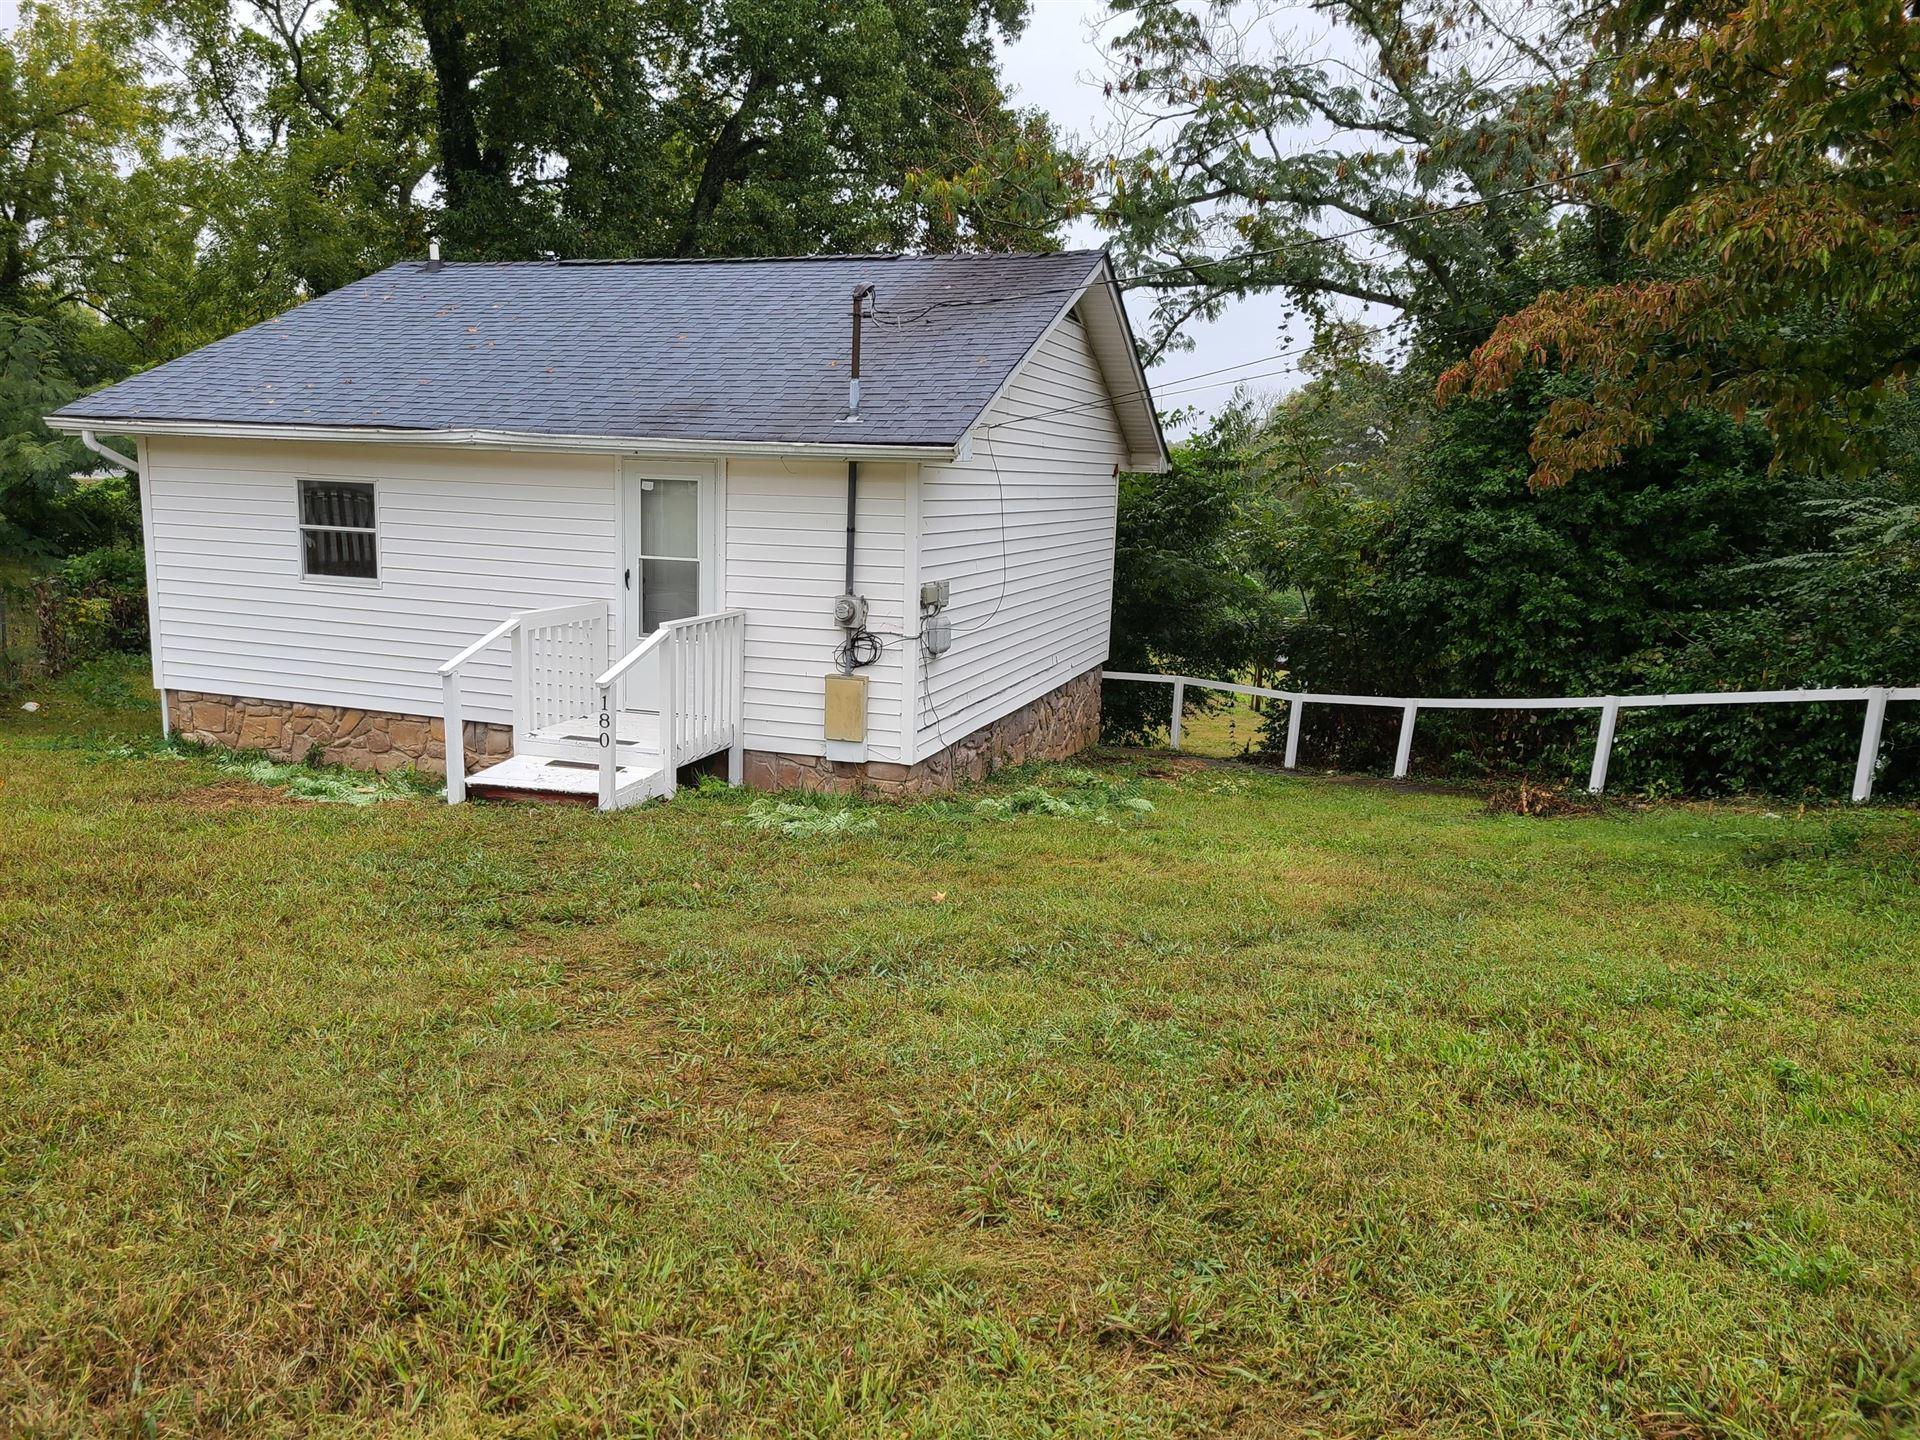 Photo of 180 Johnson Rd, Oak Ridge, TN 37830 (MLS # 1131058)